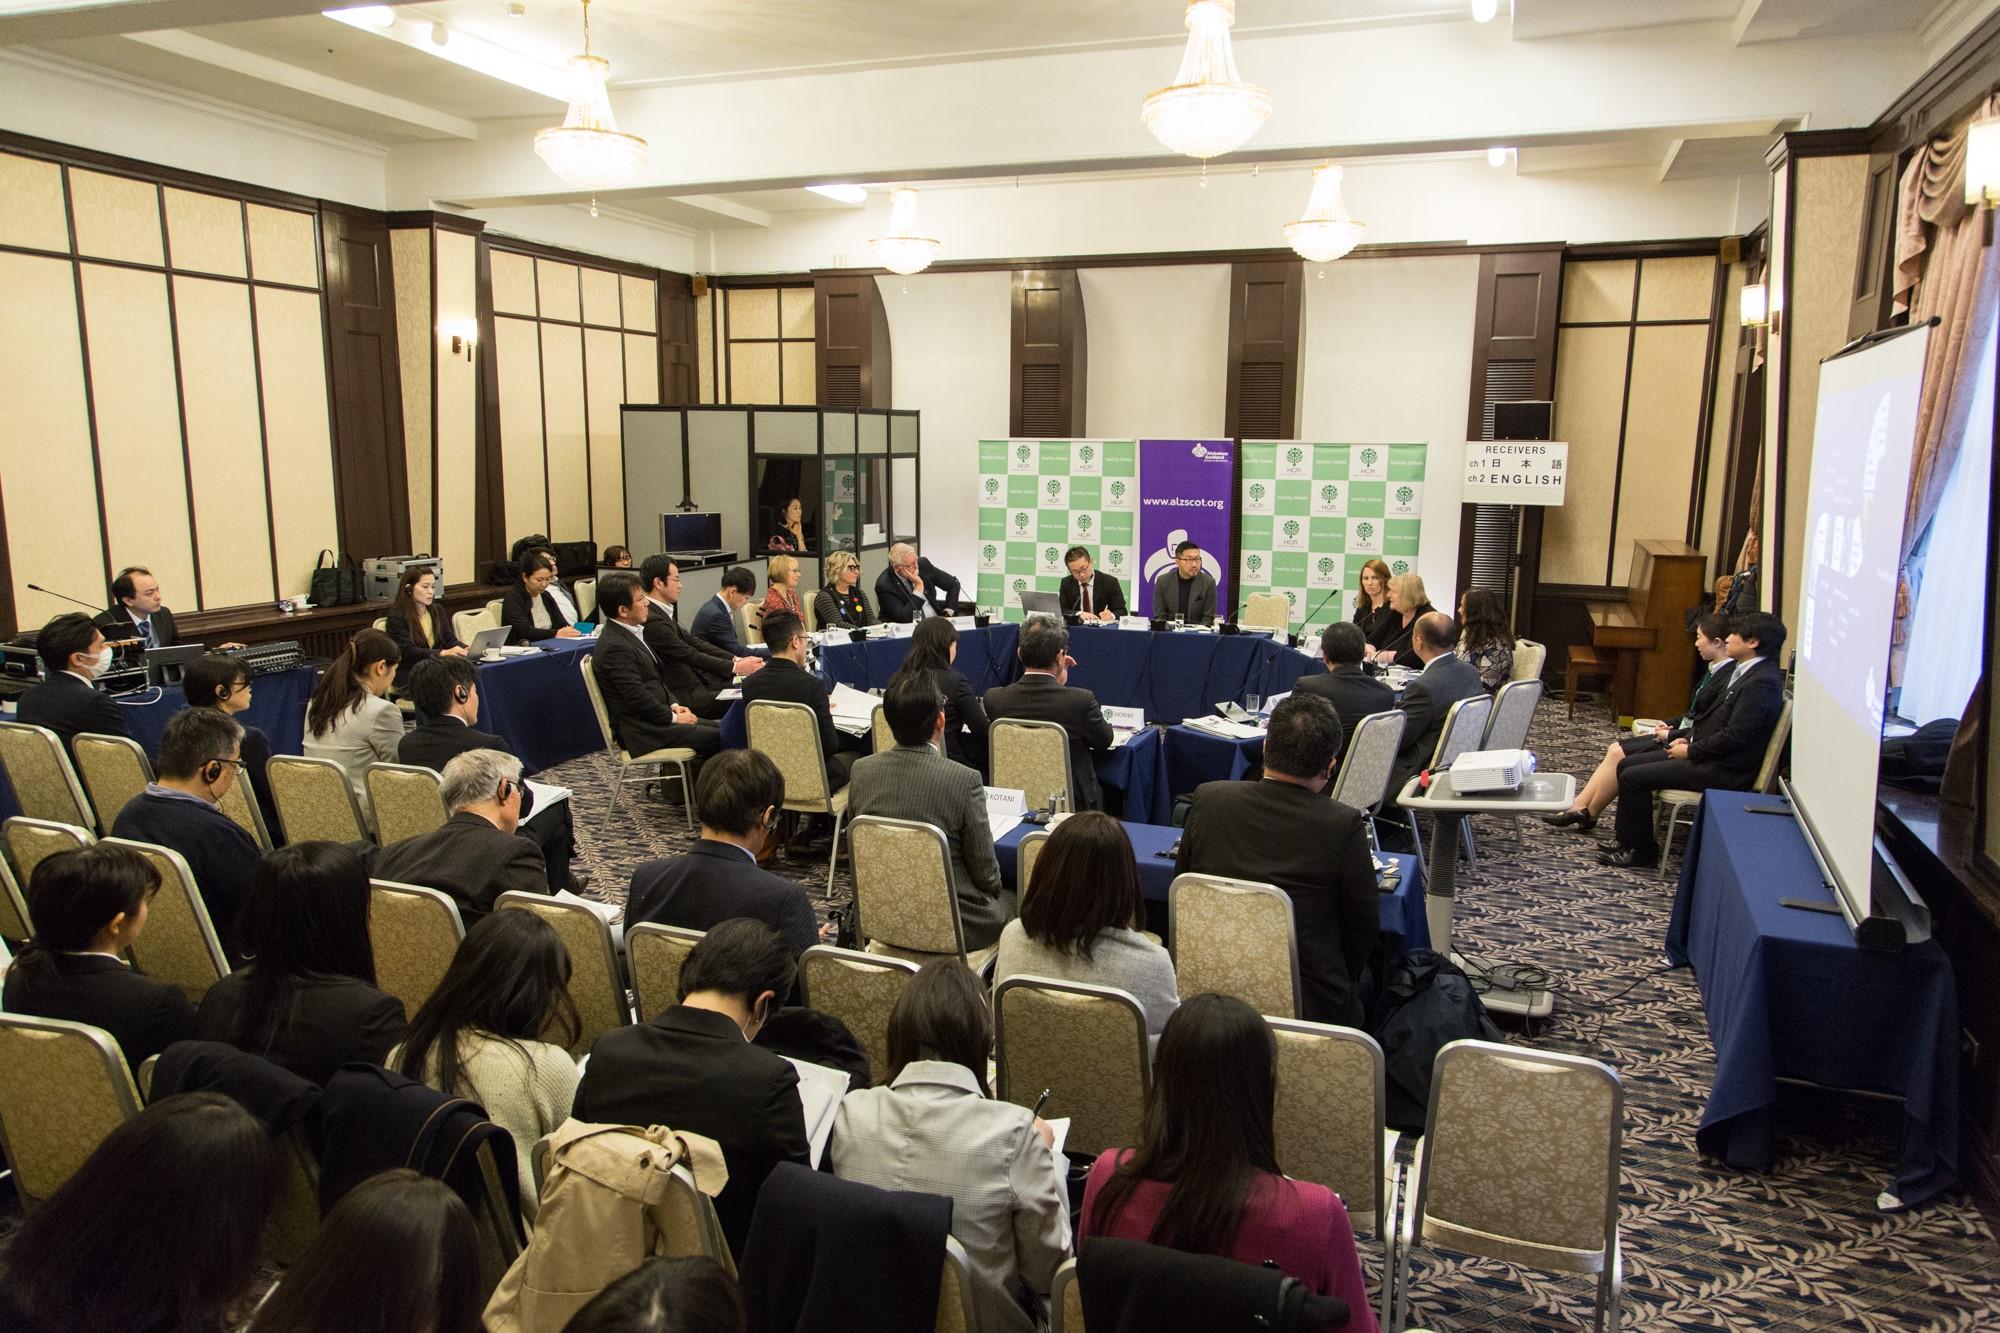 [Event Report] Japan-UK-Australia Global Expert Meeting on Creating Dementia-Friendly Communities (February 14, 2019)